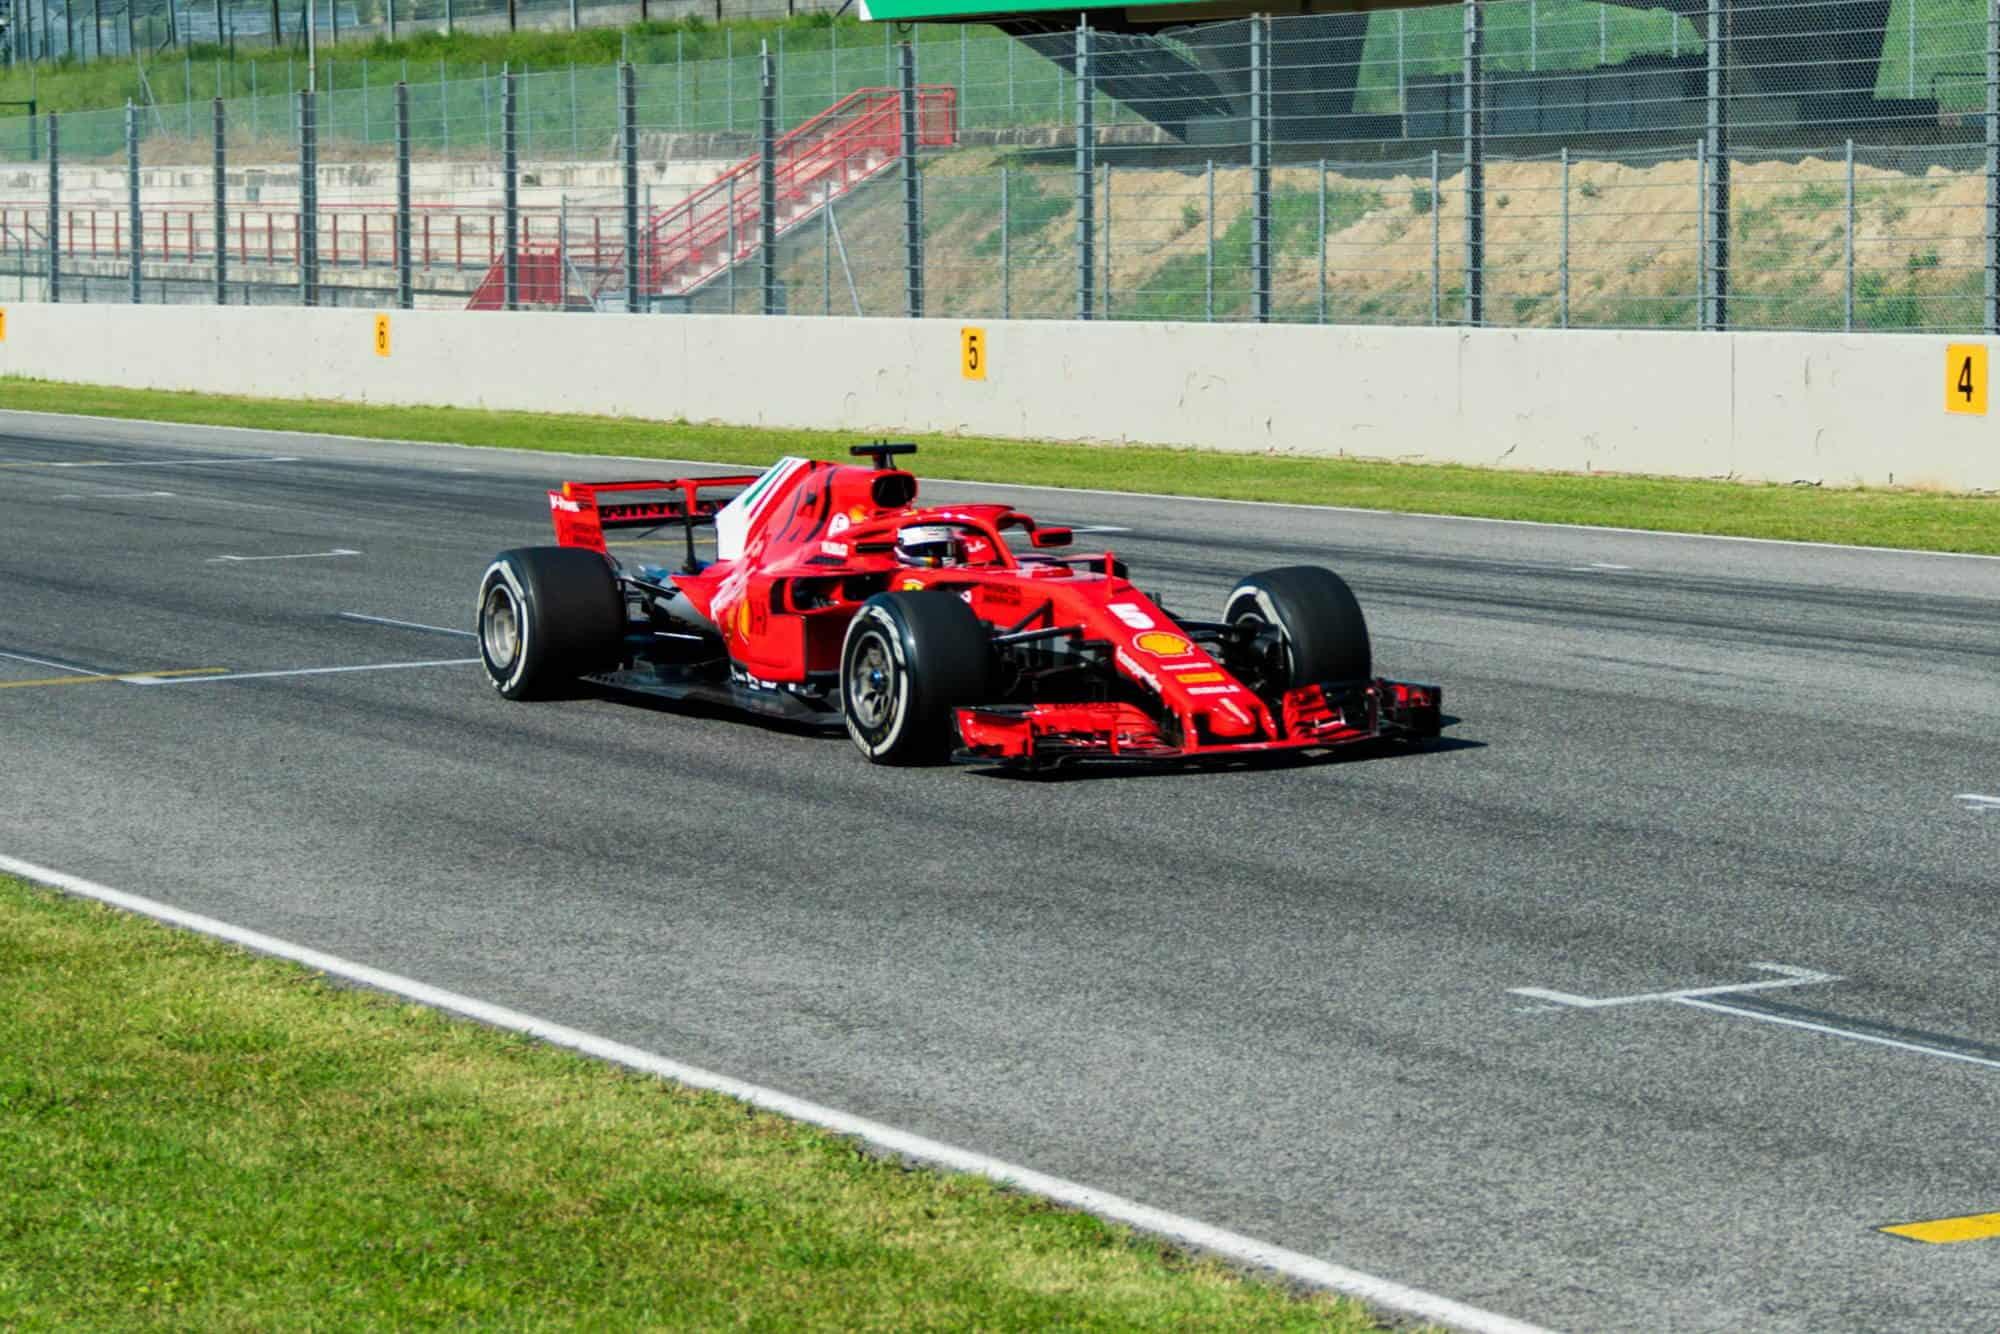 Vettel Ferrari SF71H Mugello test 23rd June 2020 Photo Ferrari